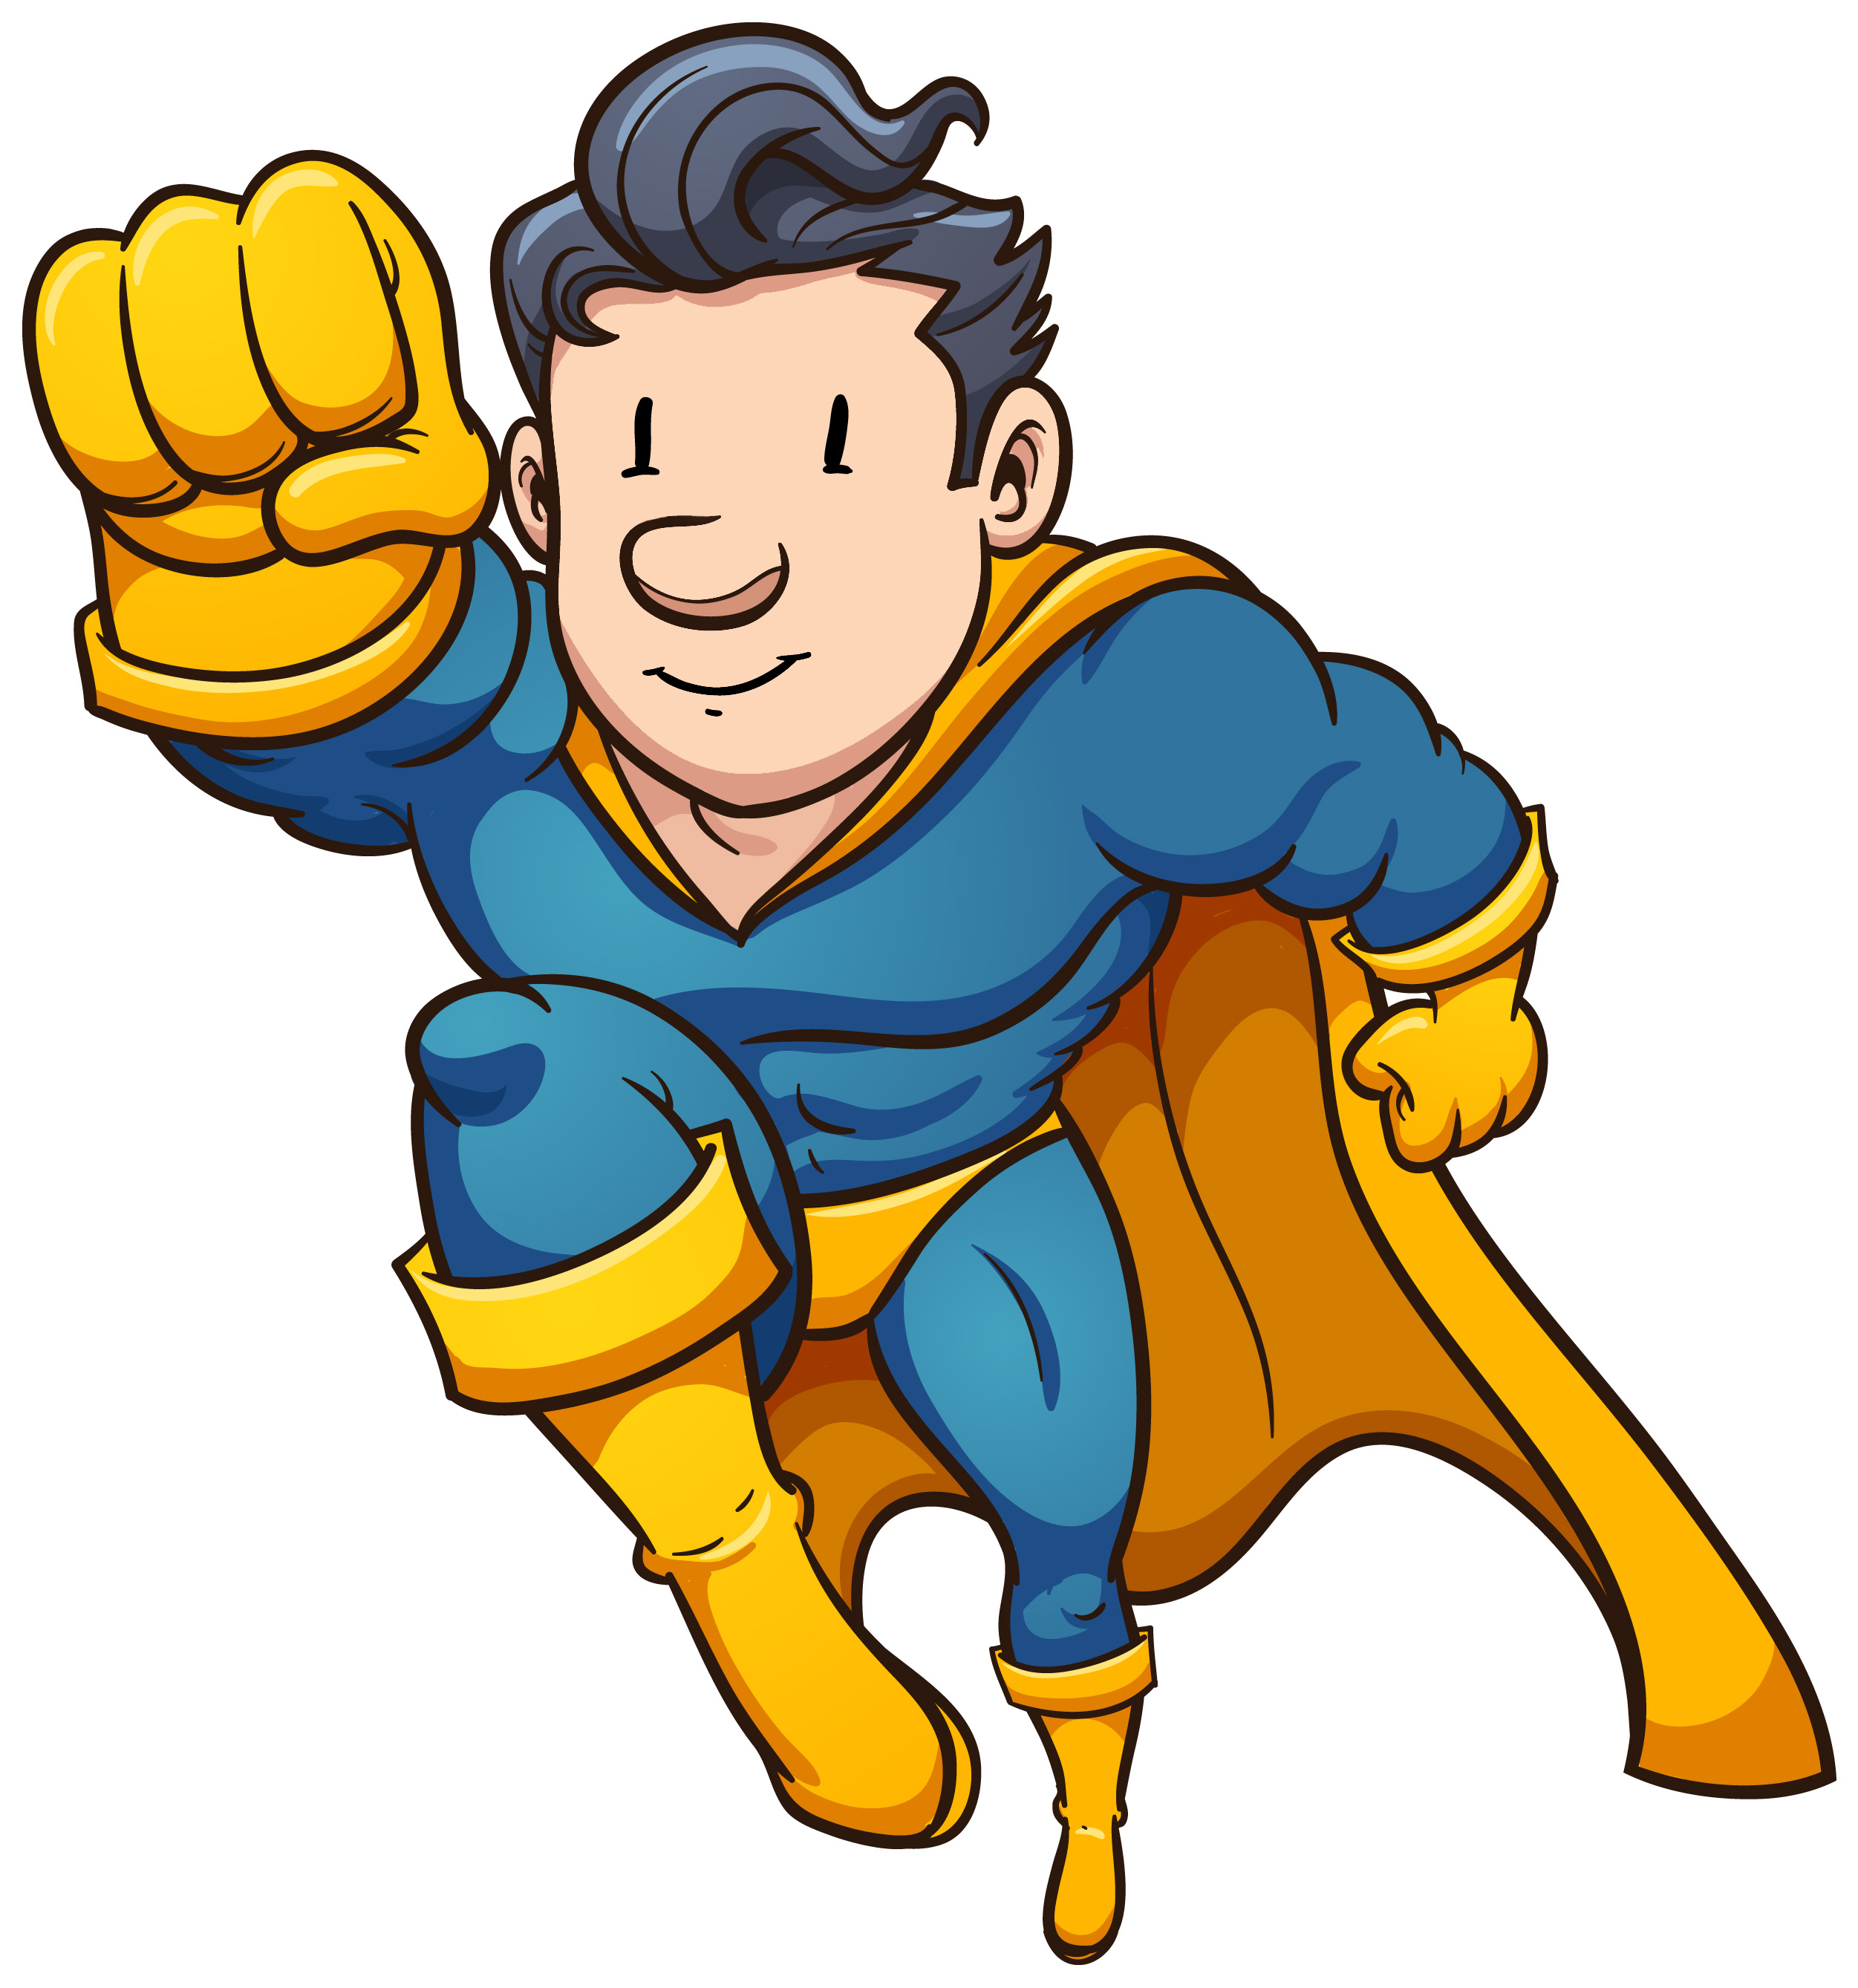 Superhero Proud Clipart School - Clipart-Superhero proud clipart school - ClipartFox ...-19